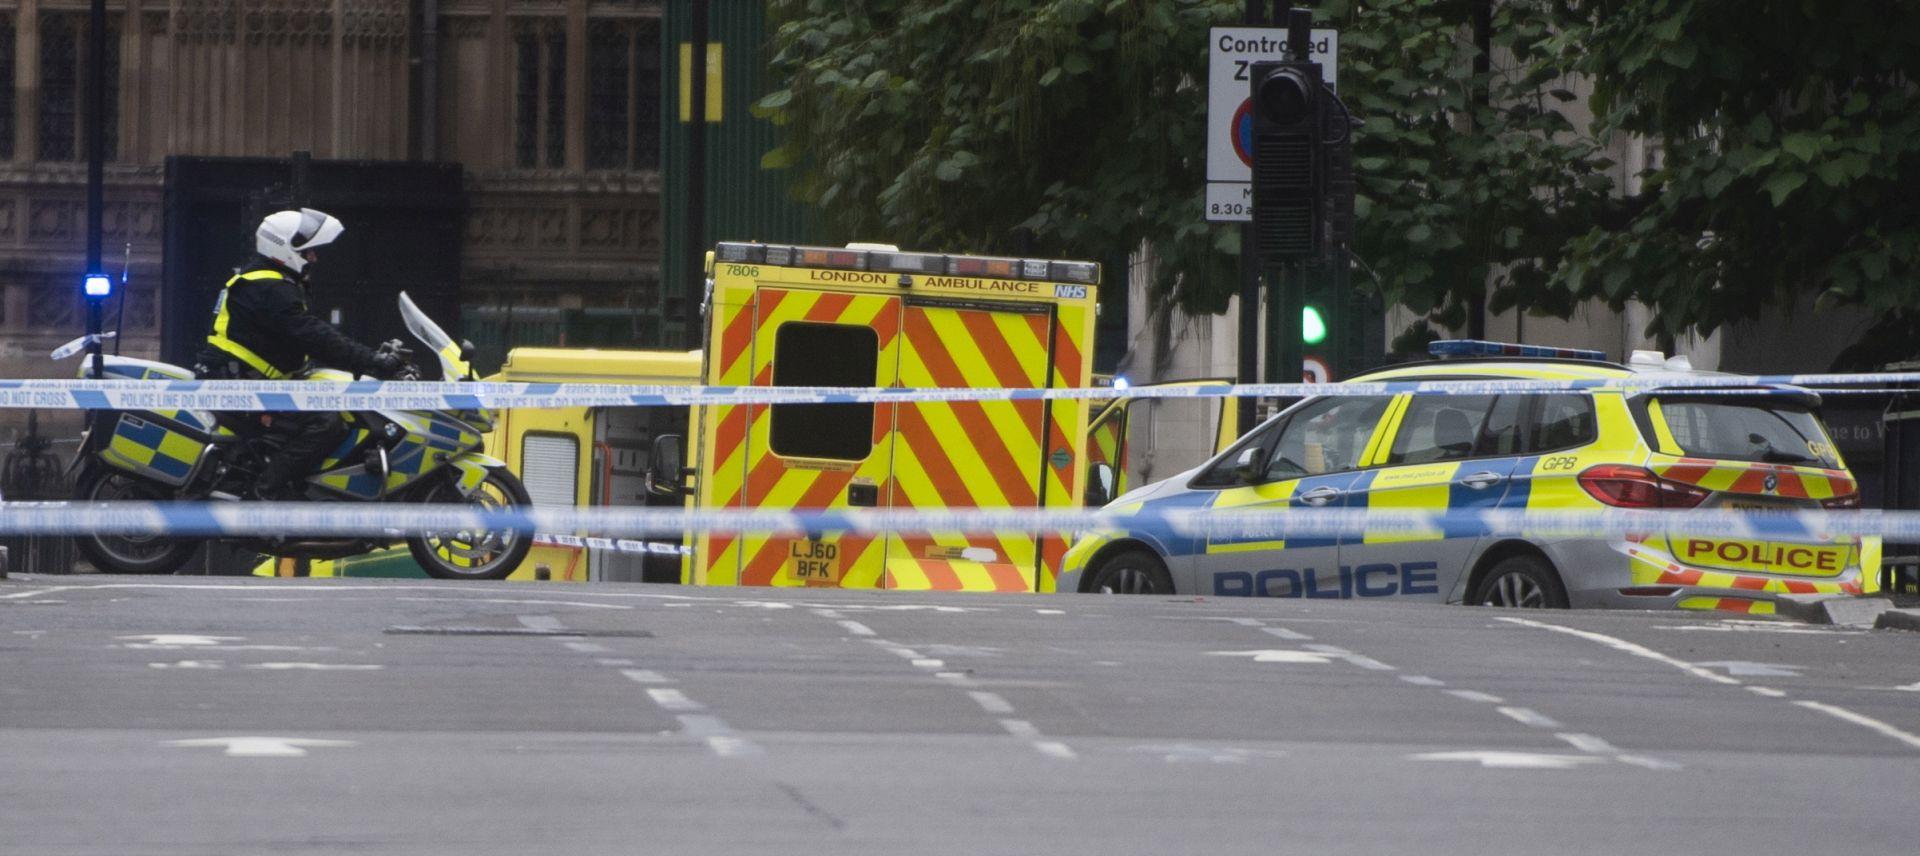 Identificiran osumnjičeni za napad na londonski parlament